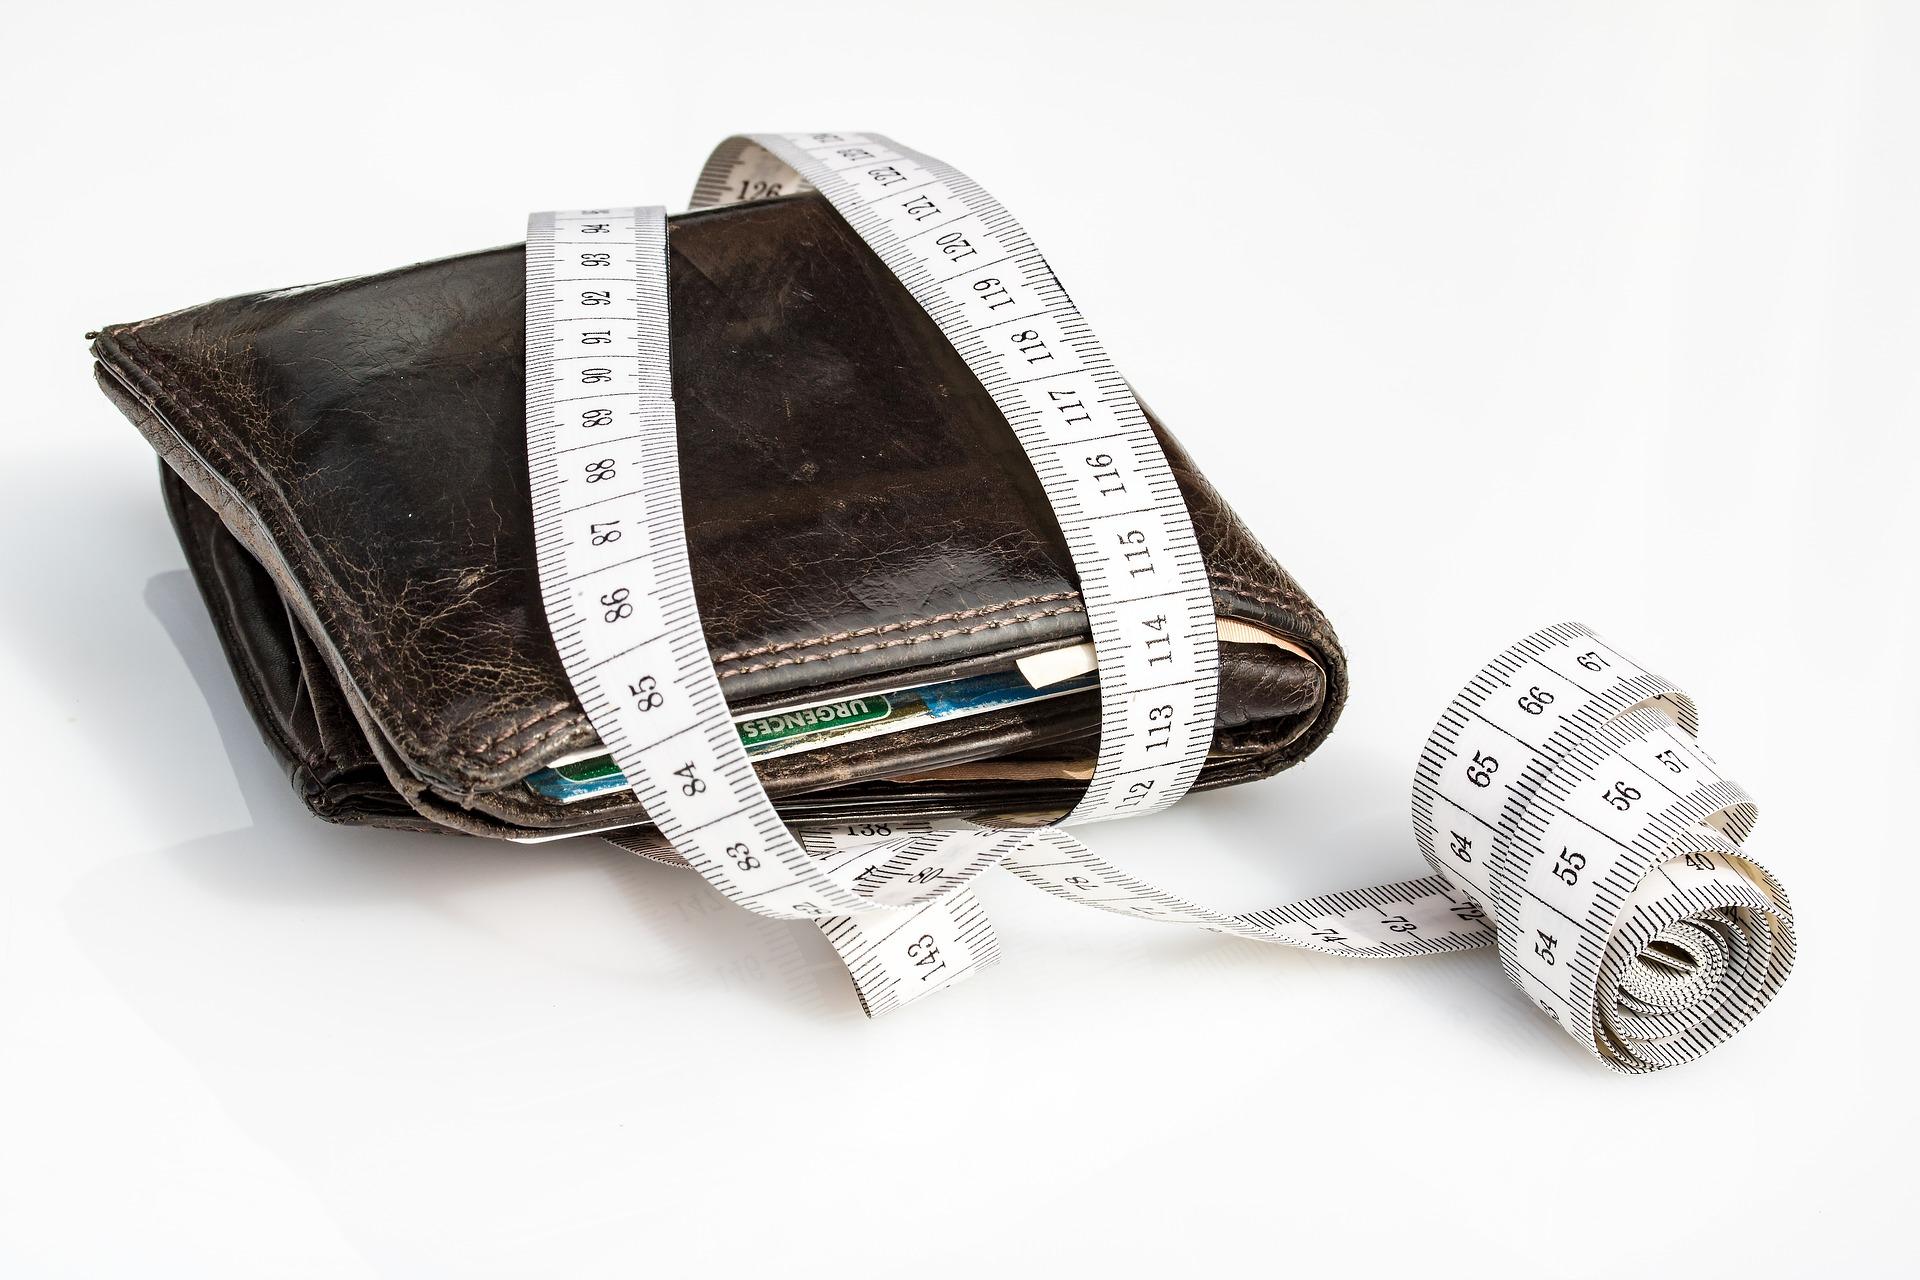 5 skutecznych metod na spłacenie debetu